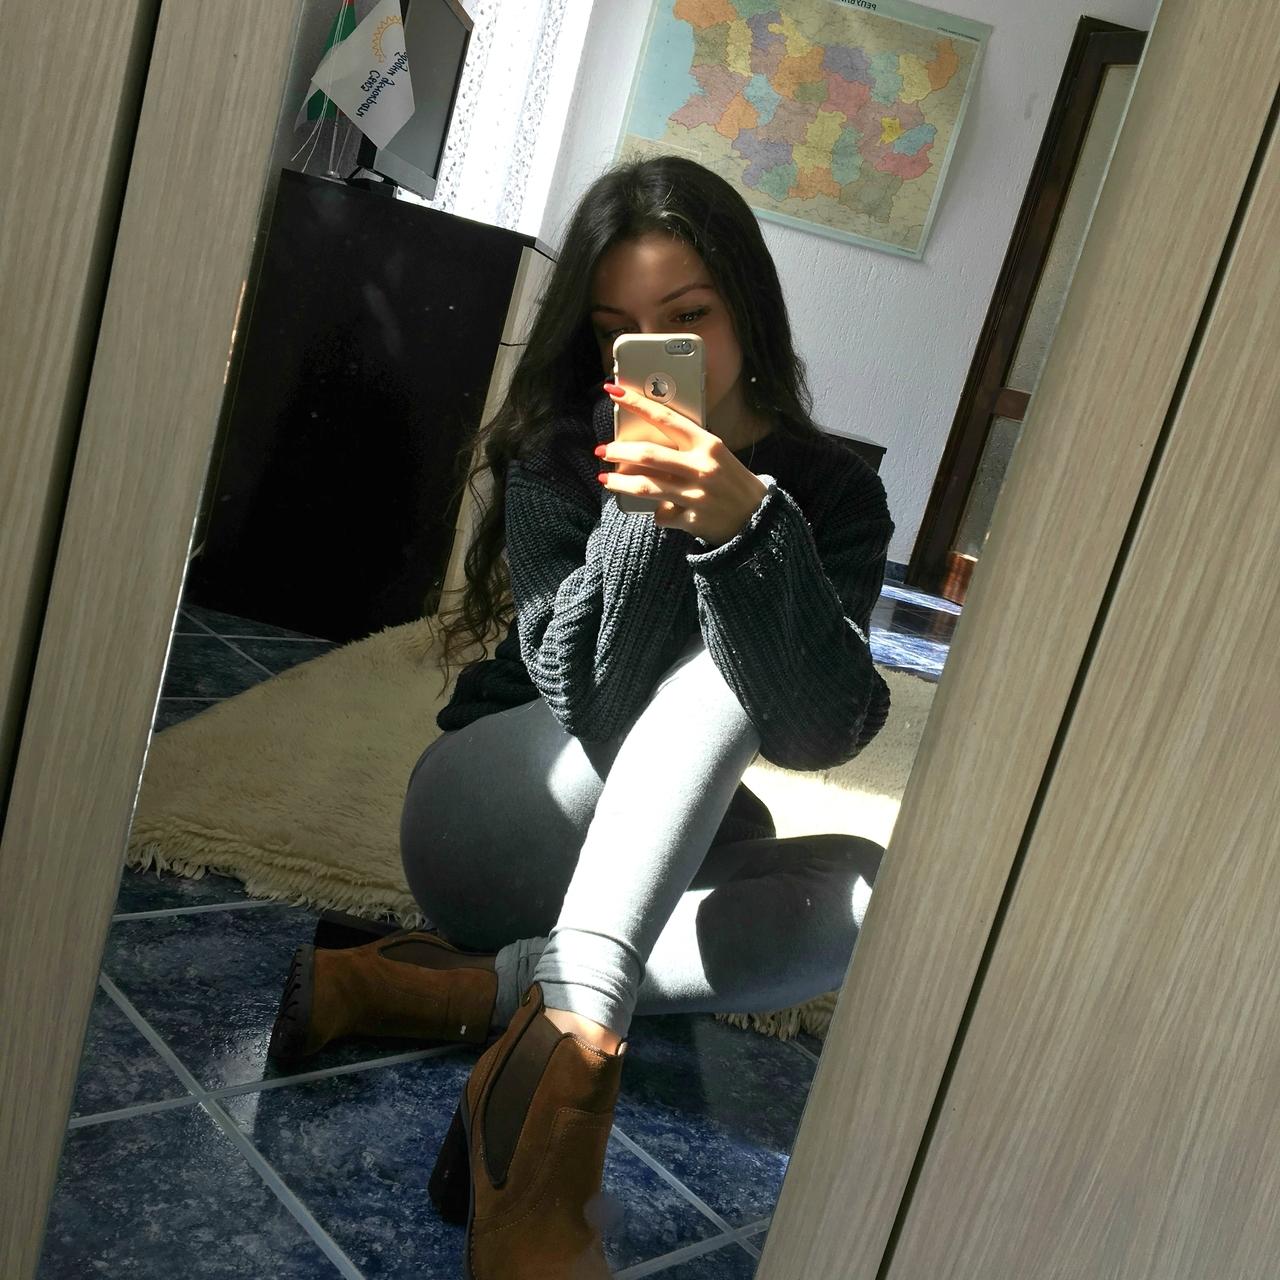 How do you take a mirror selfie